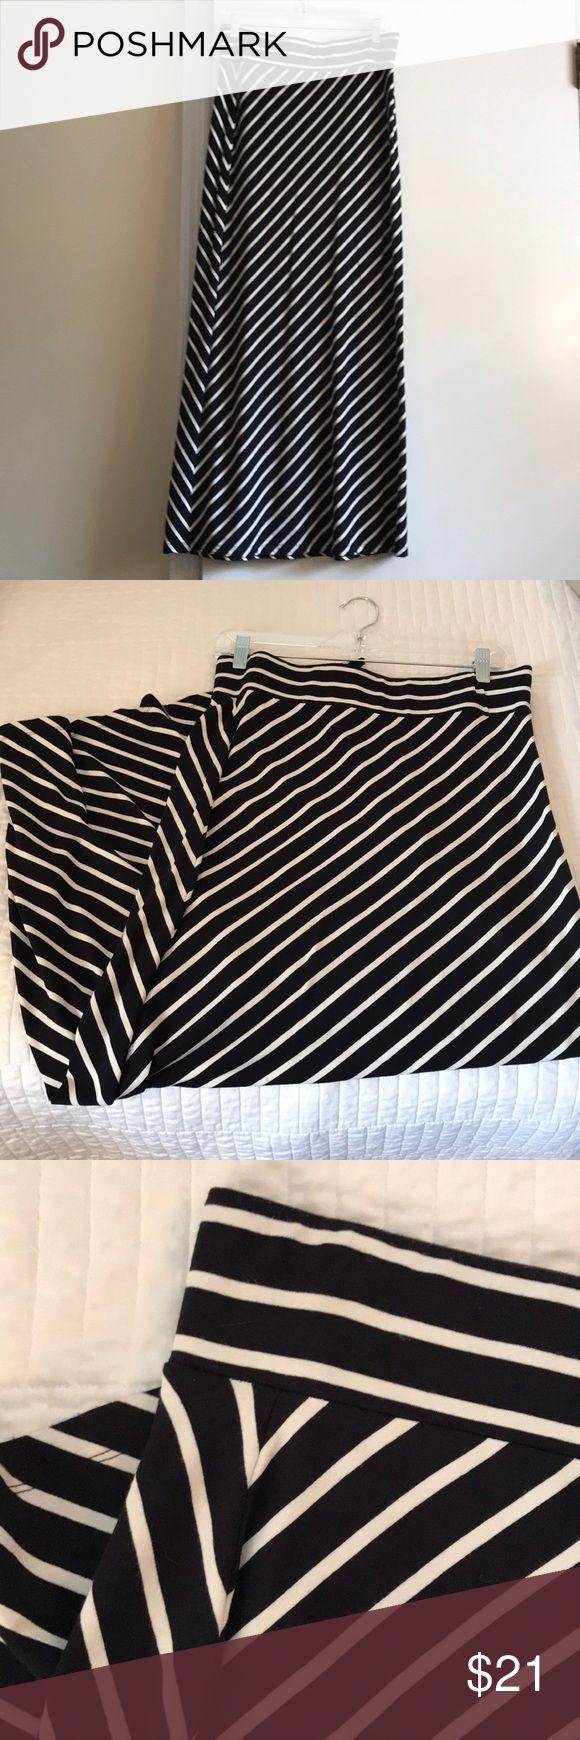 Ann Taylor Navy and Cream striped Maxi skirt Ann Taylor petites cotton Maxi skirt. Diagonal cream stripes. 93% Rayon 7% spandex. Ann Taylor Skirts Maxi